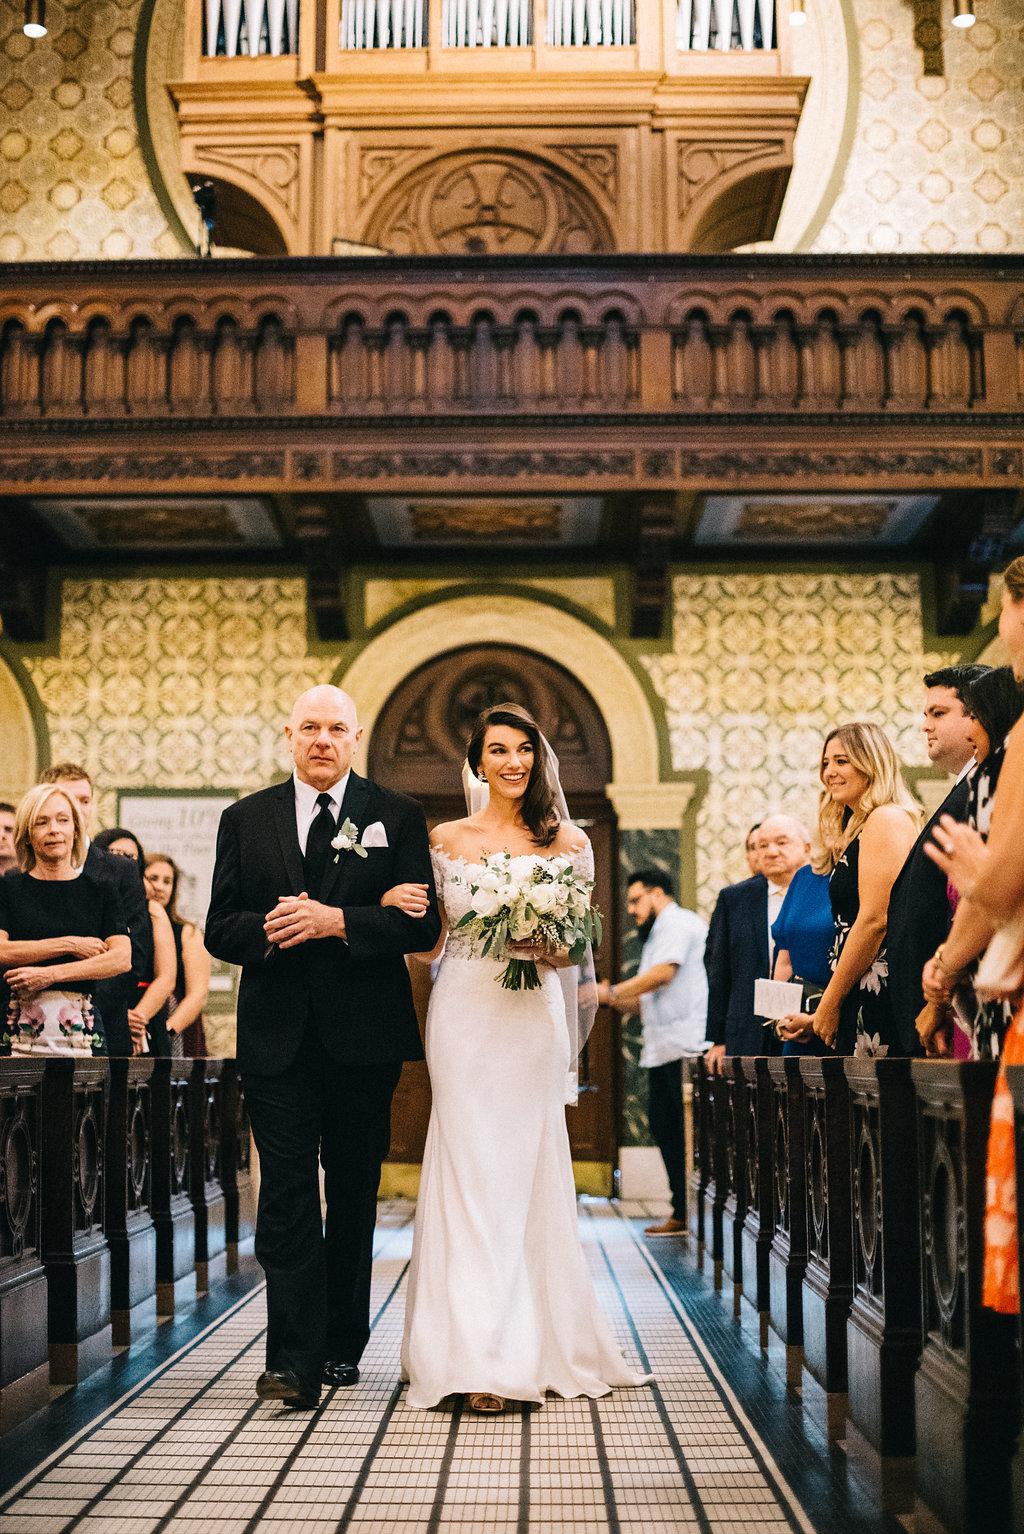 0182--Katelyn_+_Brendan-Wedding_Highlights-Shot_by_Couple_of_Dudes-Joe_Tighe.jpg